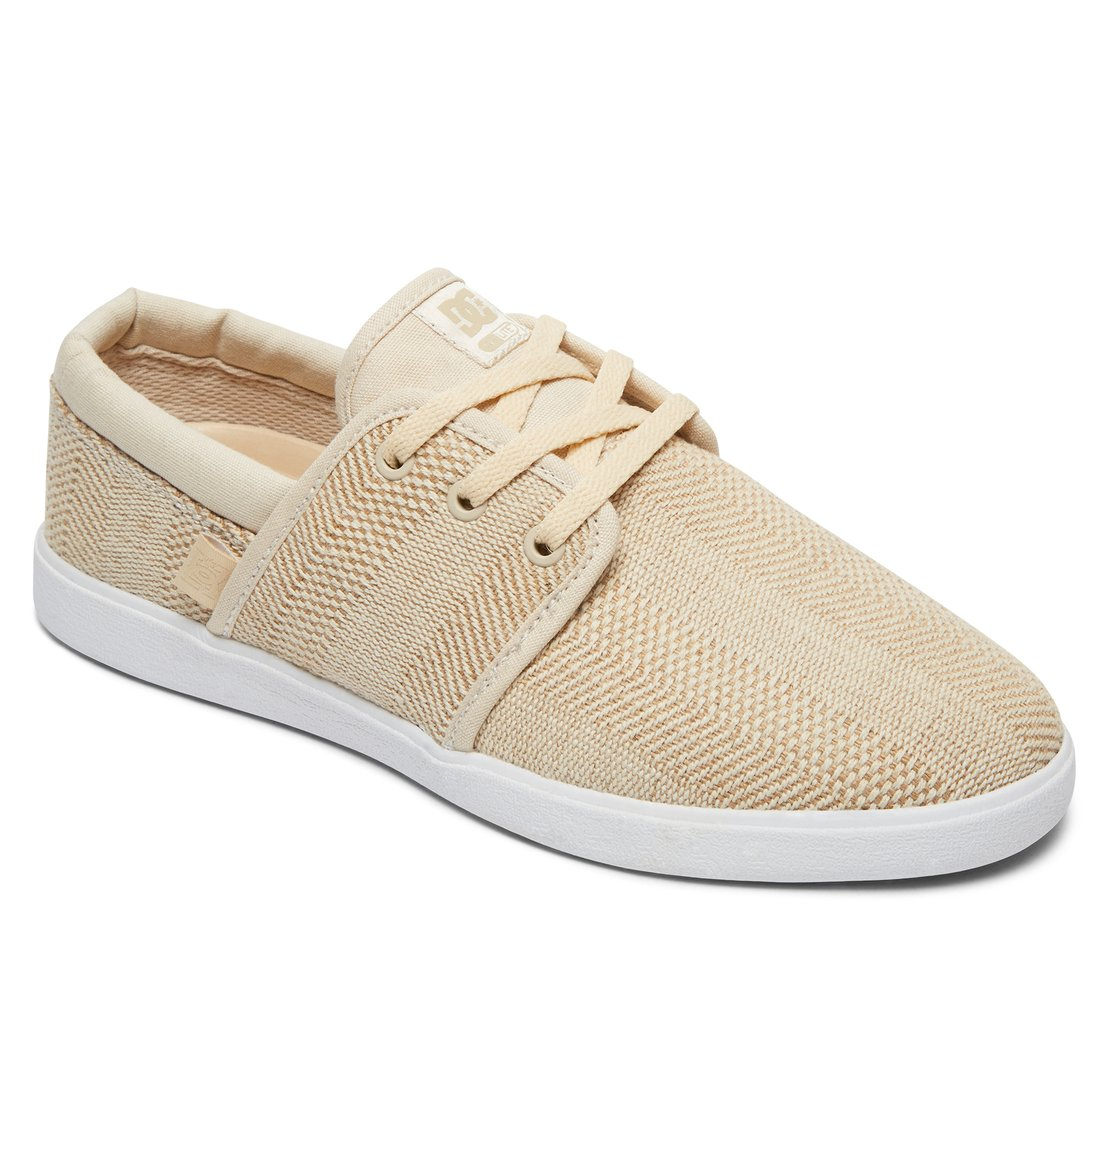 DC Shoes Schuhe »Haven TX SE«, braun, Taupe